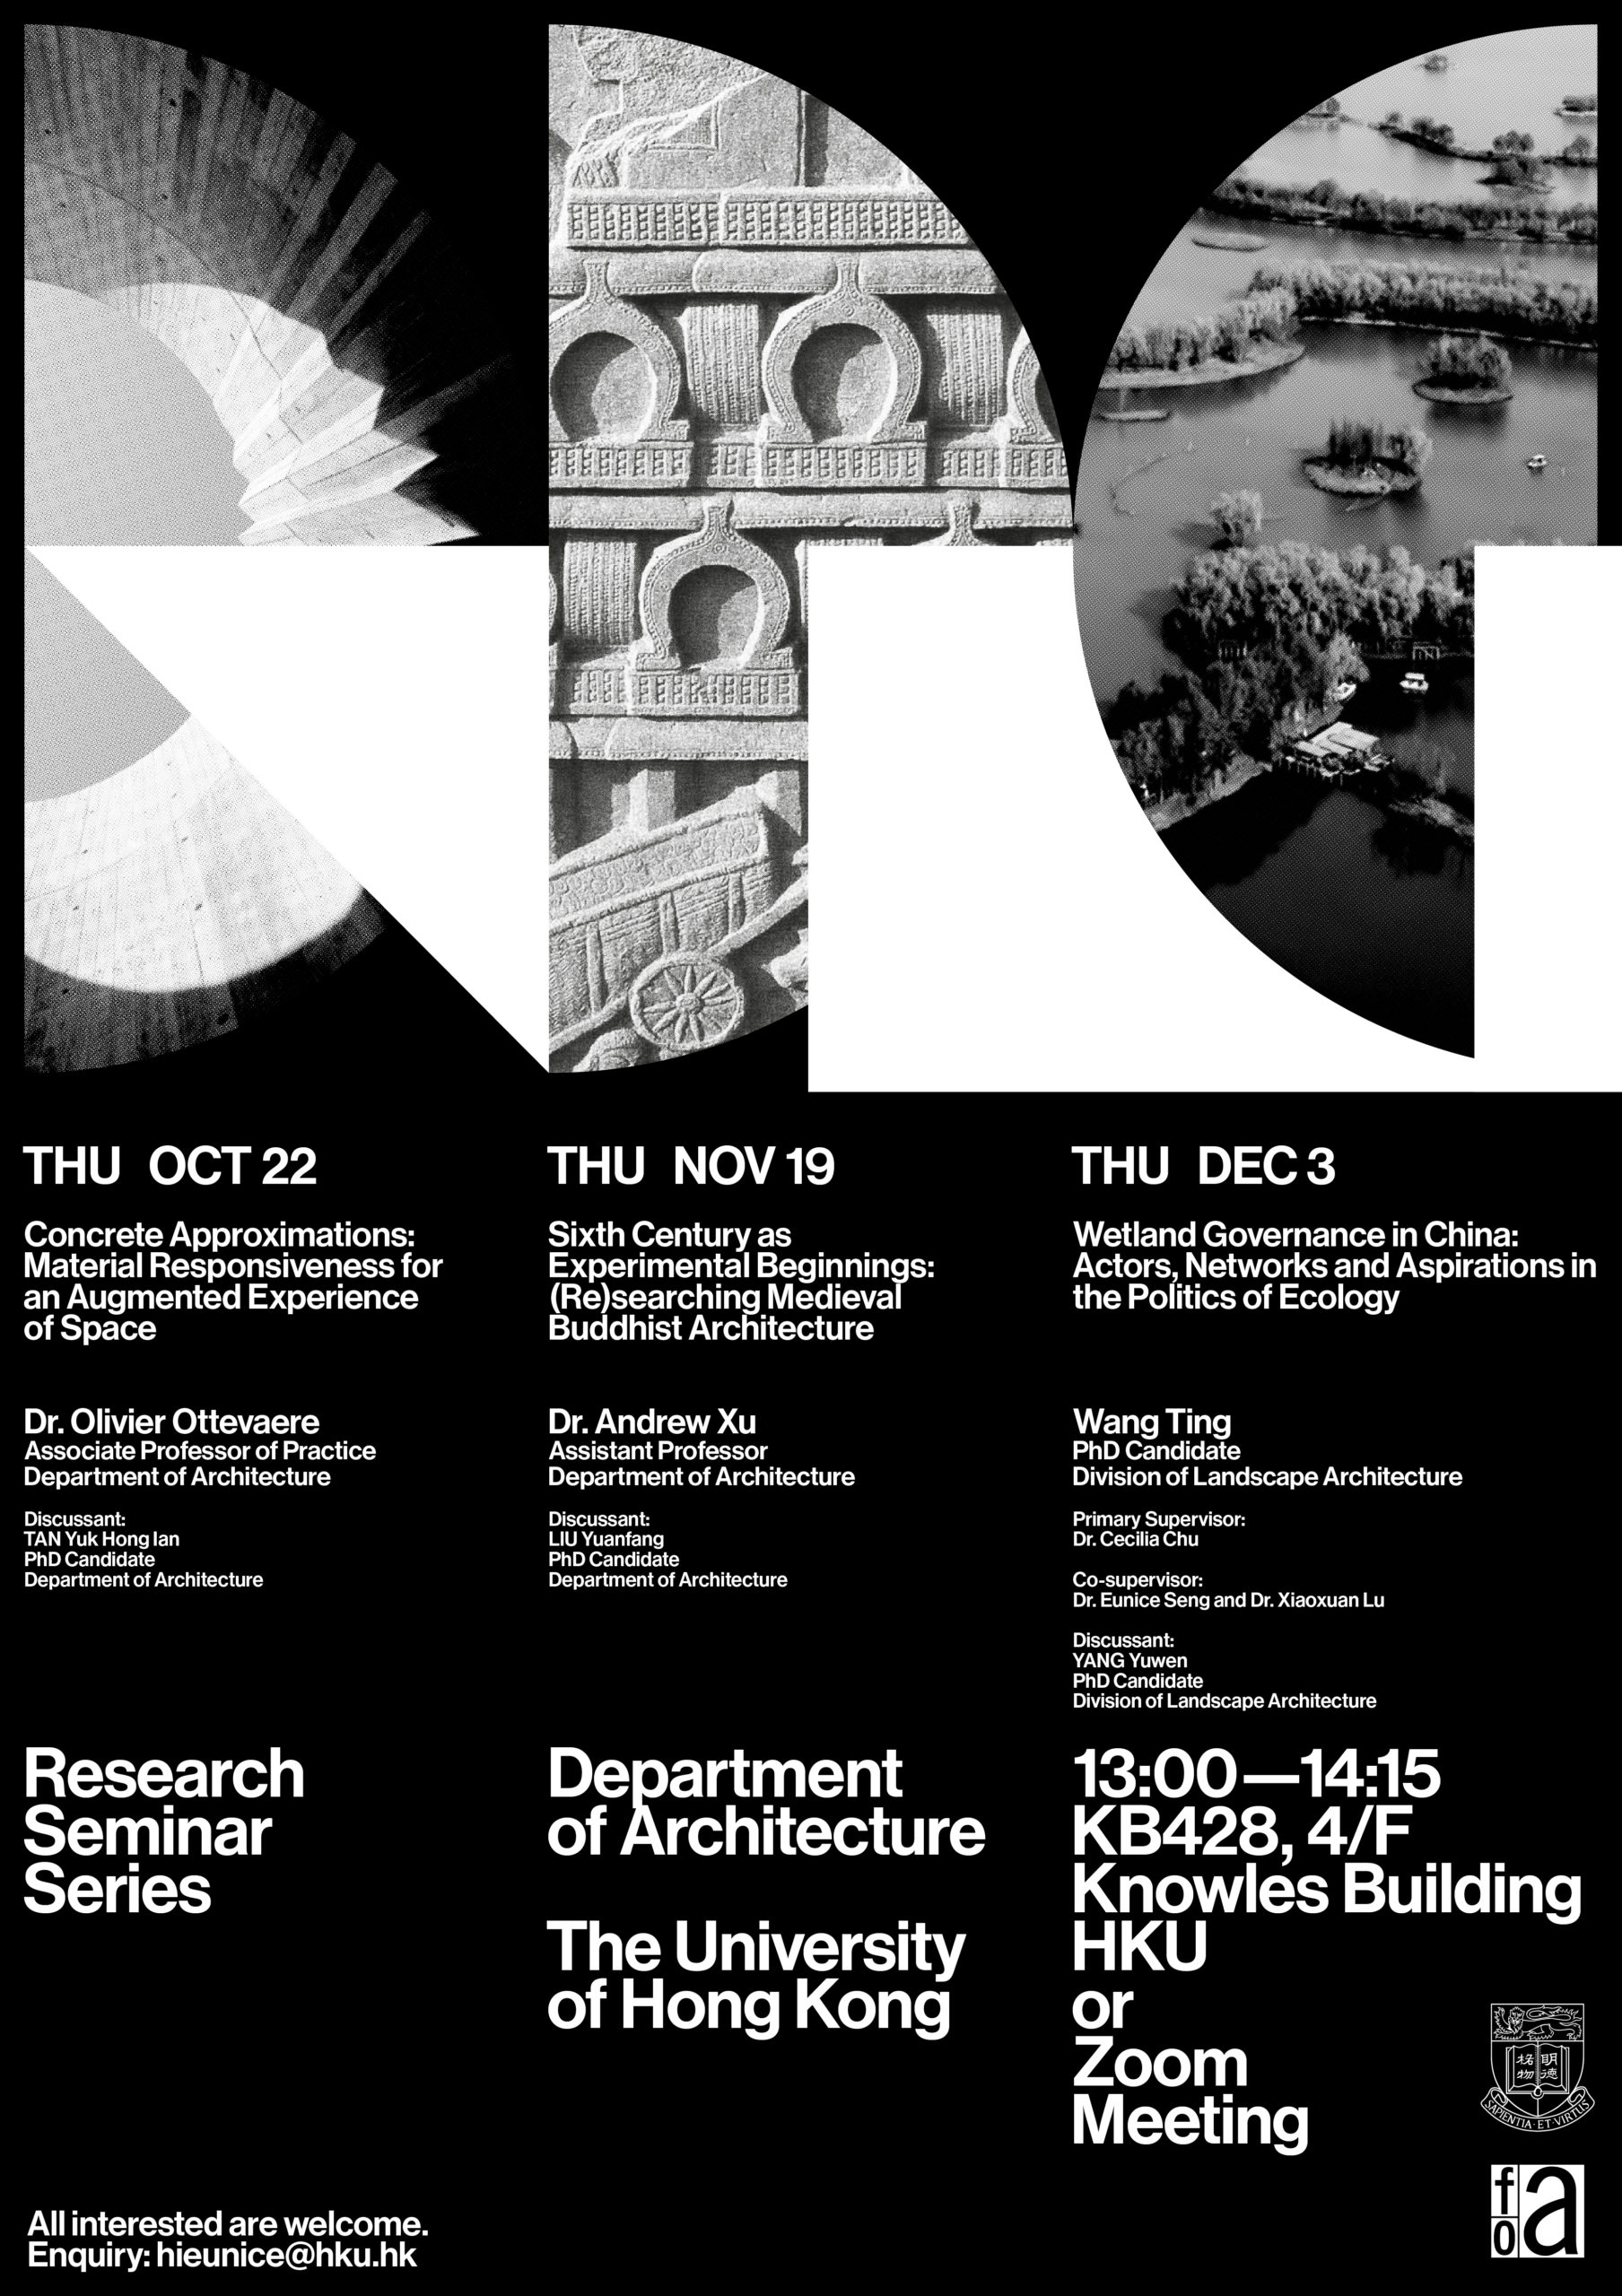 Research Seminar Series Fall 2020